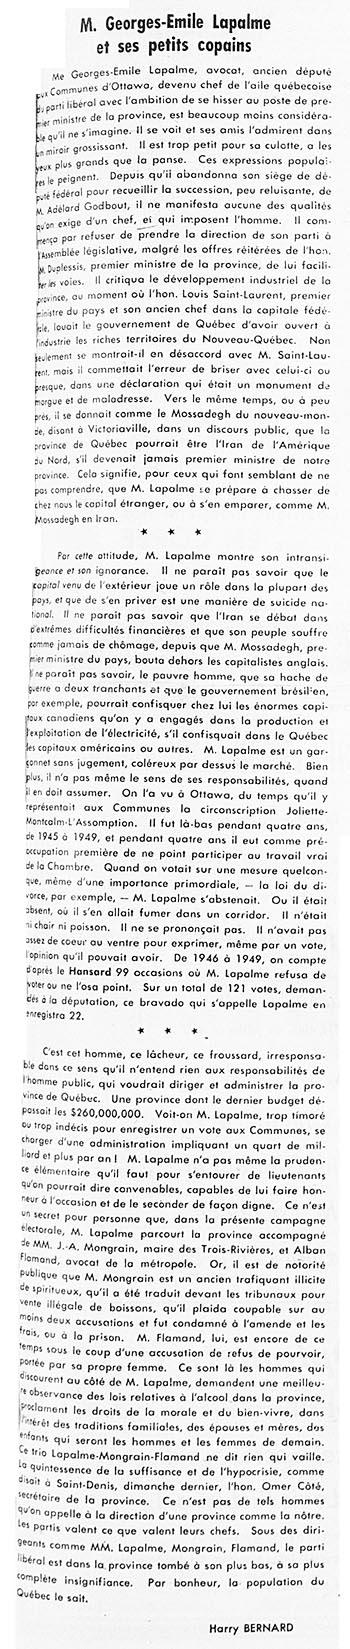 edito_4juillet1952_350